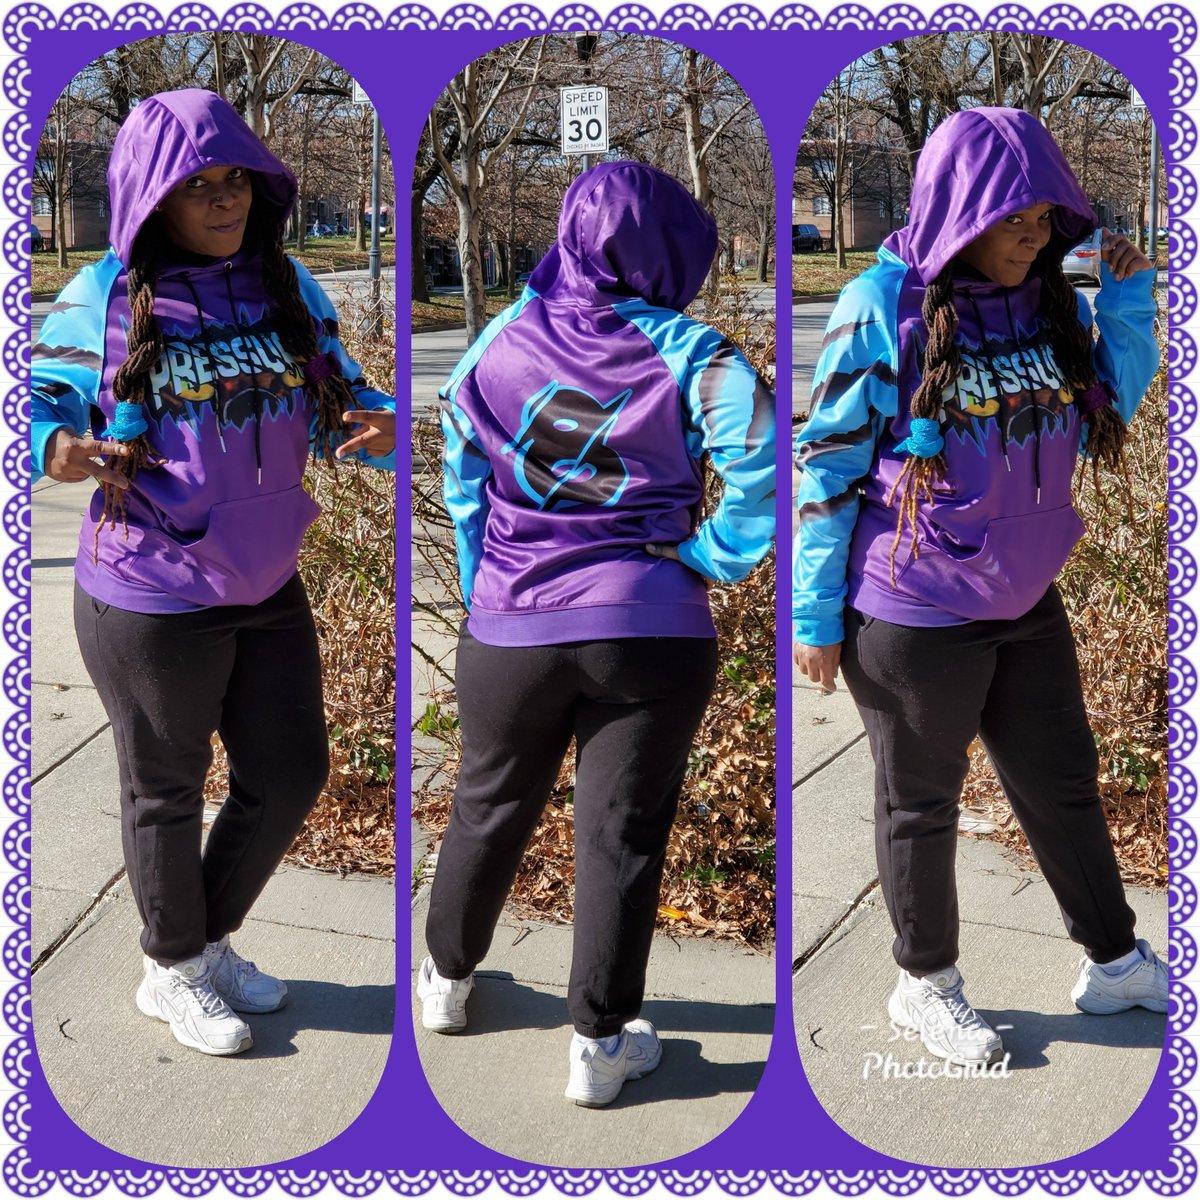 Reppin three of my favorite things.. @era8apparel @new_era8 @baltimoreentertainers #PurpleIsRoyal #RavensFlock #Ravenet4Life #MVP #AnkleBreaker #MyBmore #IBackLamar #8  #MLKParade2020 pic.twitter.com/aEVys6cgNP – at Pennsylvania Avenue Main Street